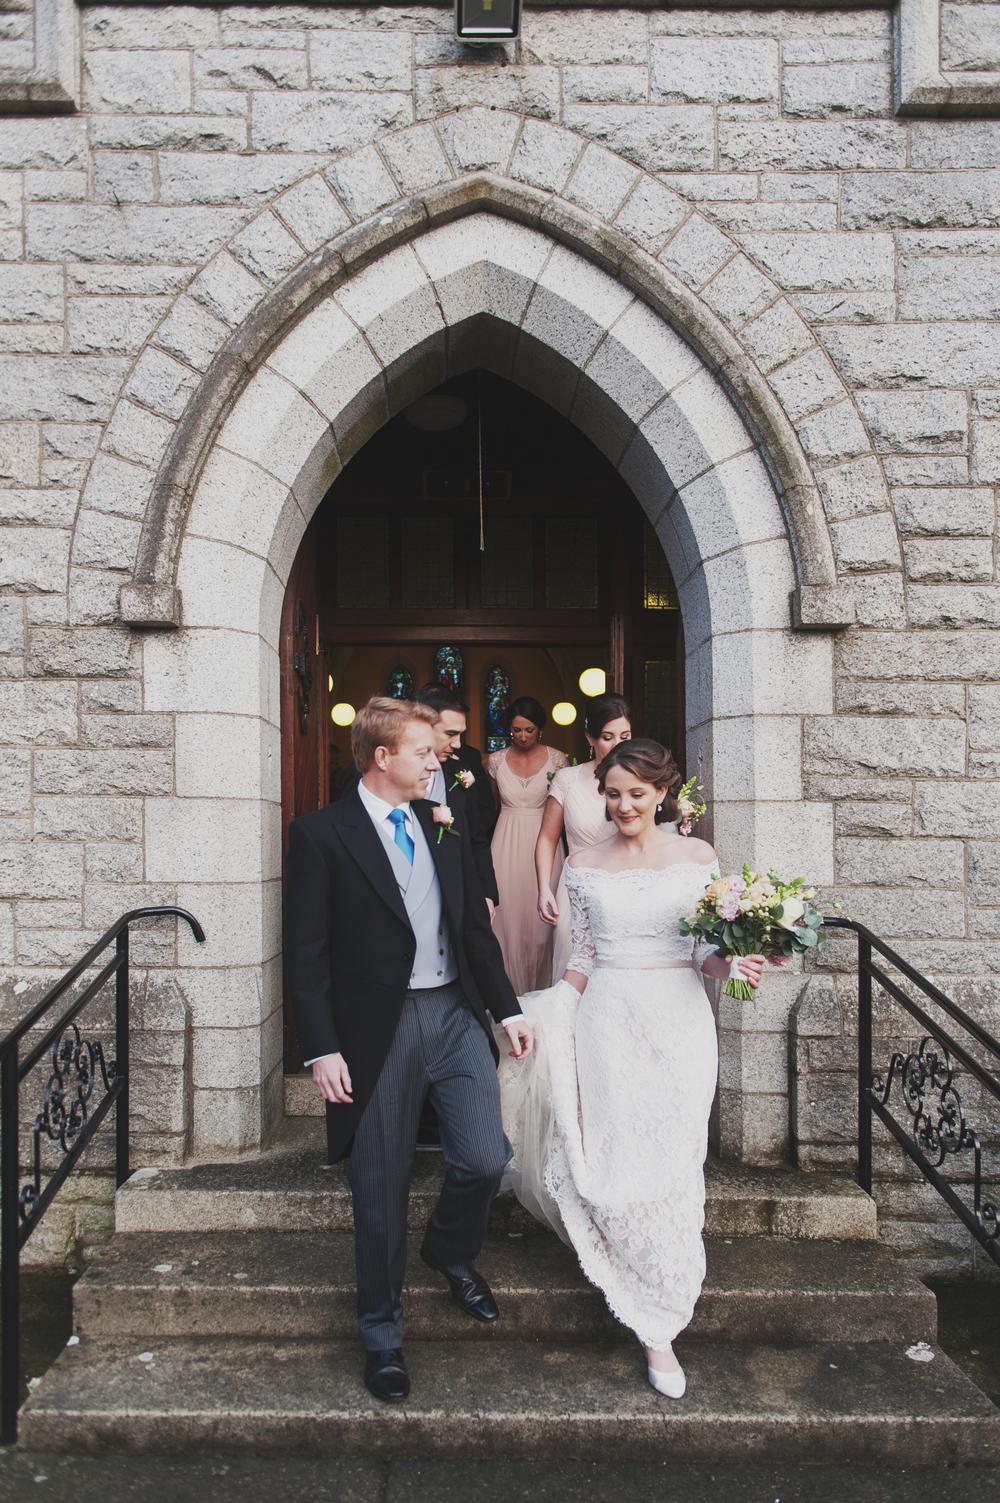 Carton_House_Wedding_Photography_Maynooth_Ireland_052.jpg